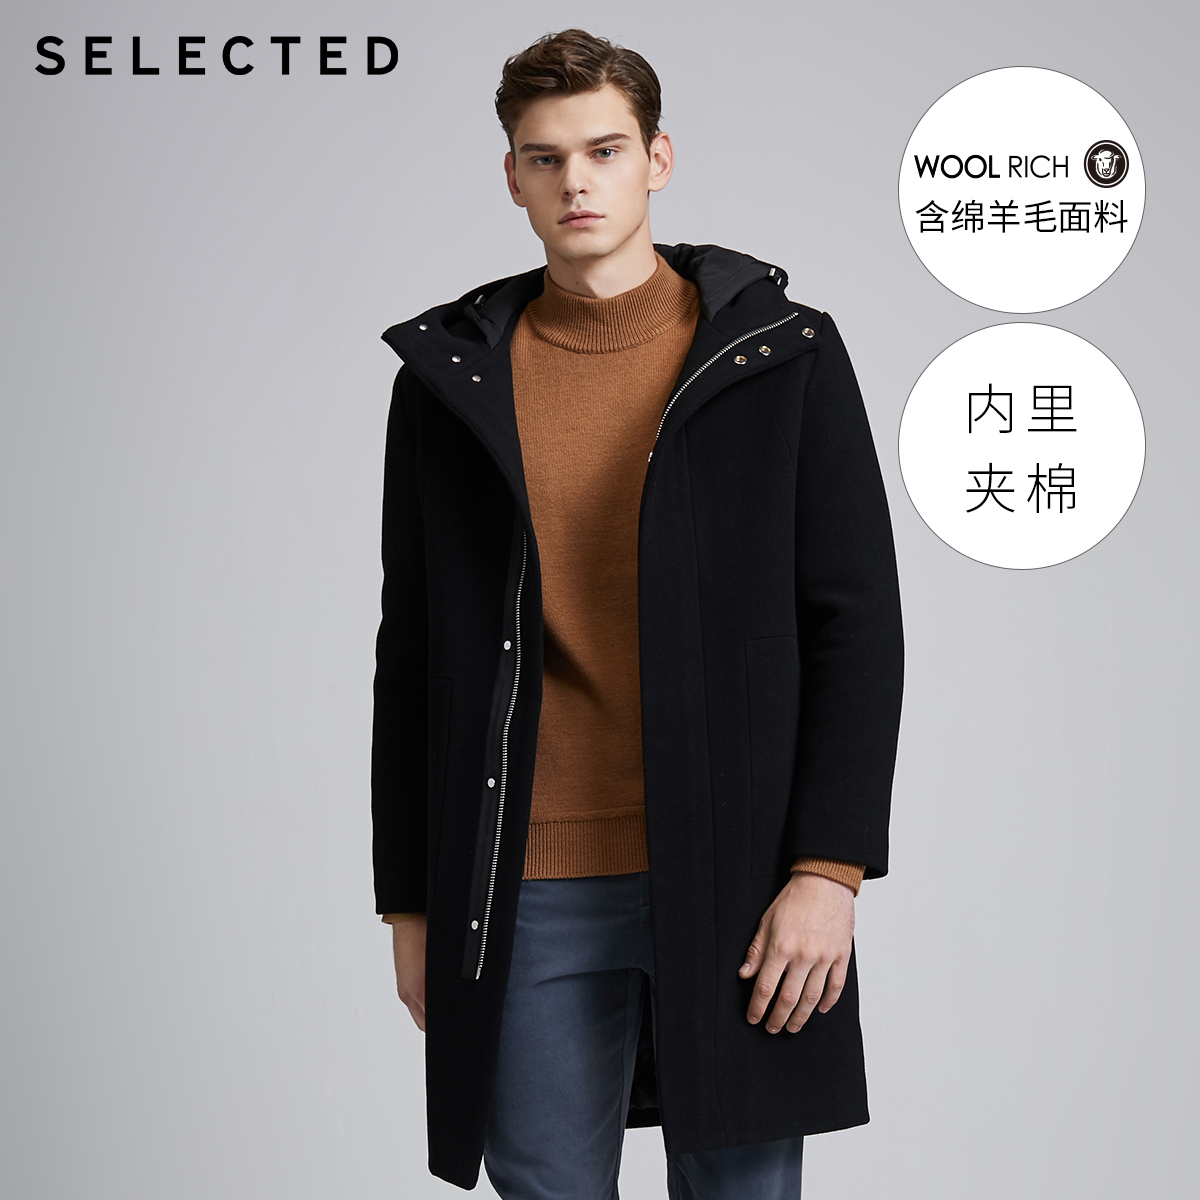 SELECTED Cotton Padding Woolen Outwear Men's Mid-length Wool Coat|419427549